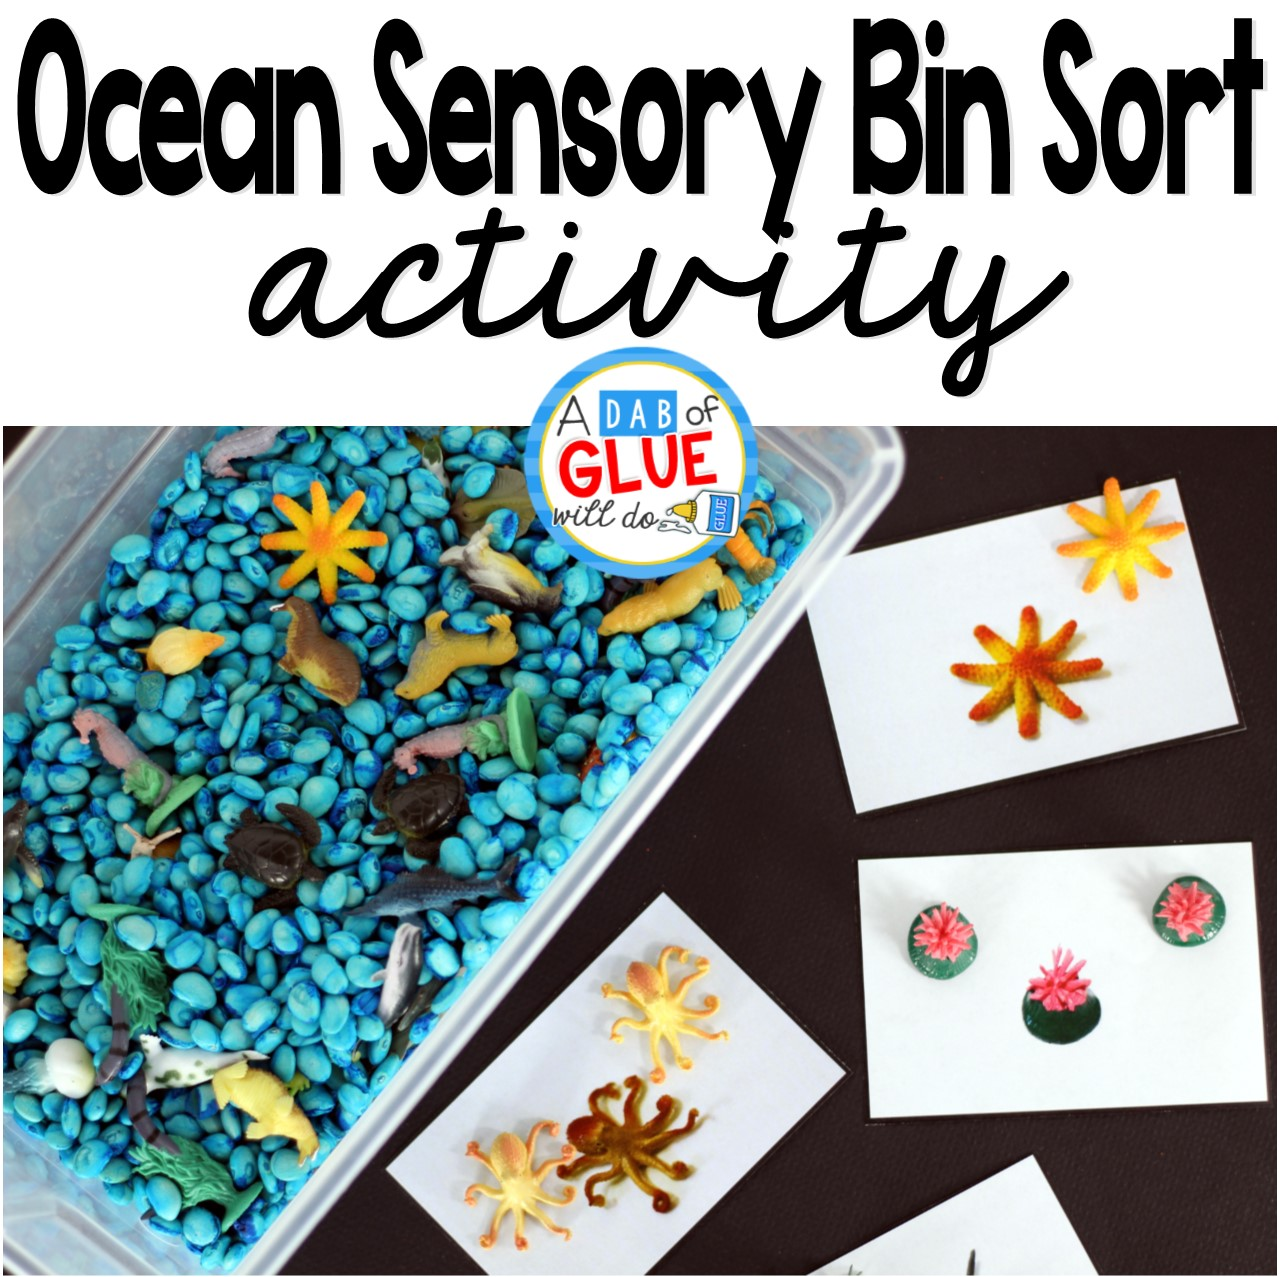 Ocean Sensory Bin Sorting Activity